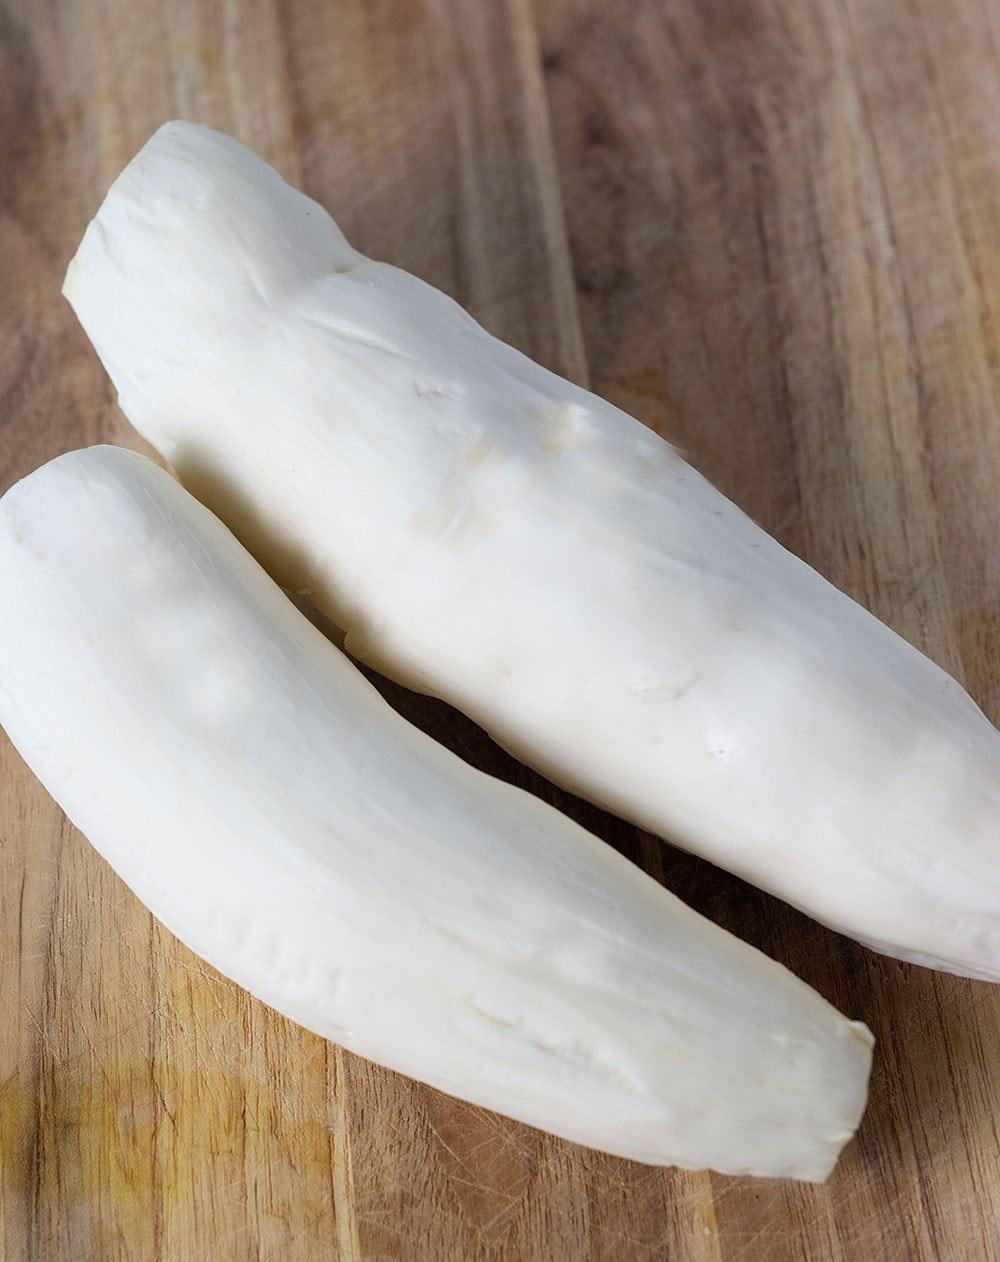 Cassava peeled for bammy